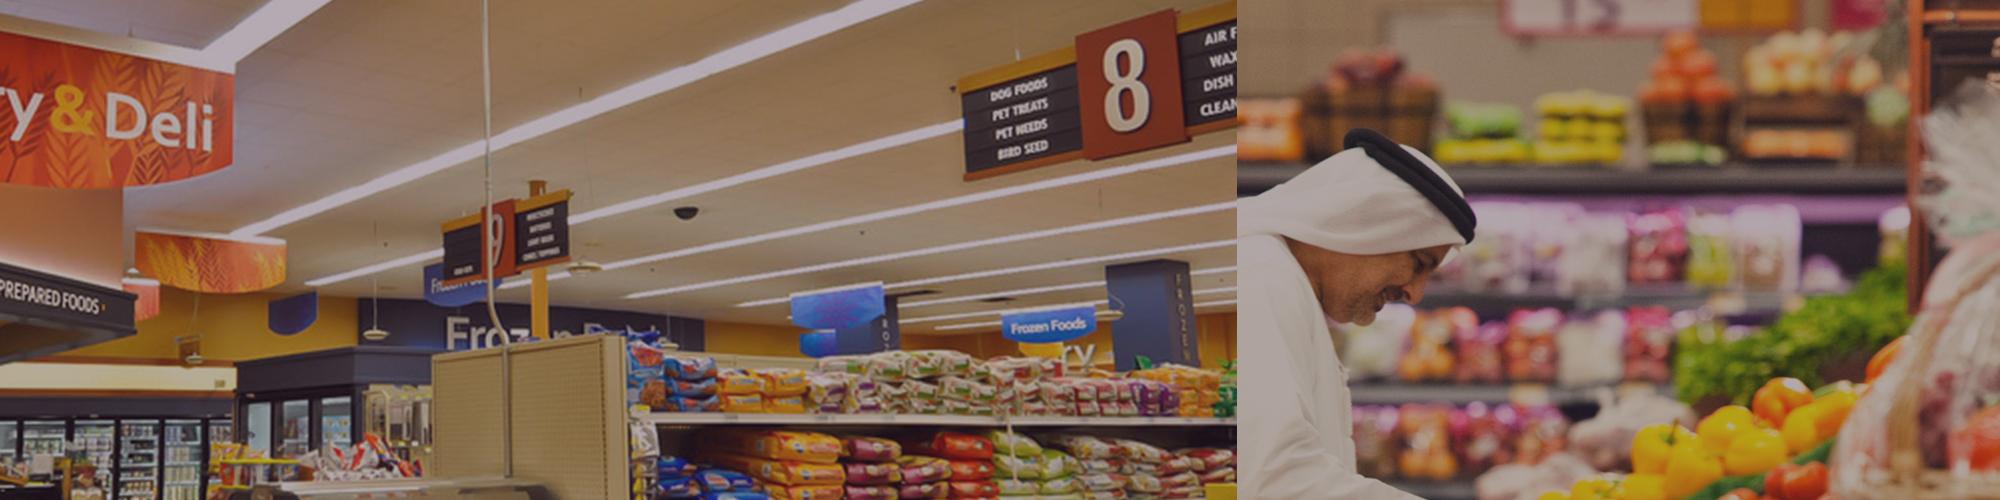 supermarket-for-sale-lease-in-dubai-uae | Riveria Global